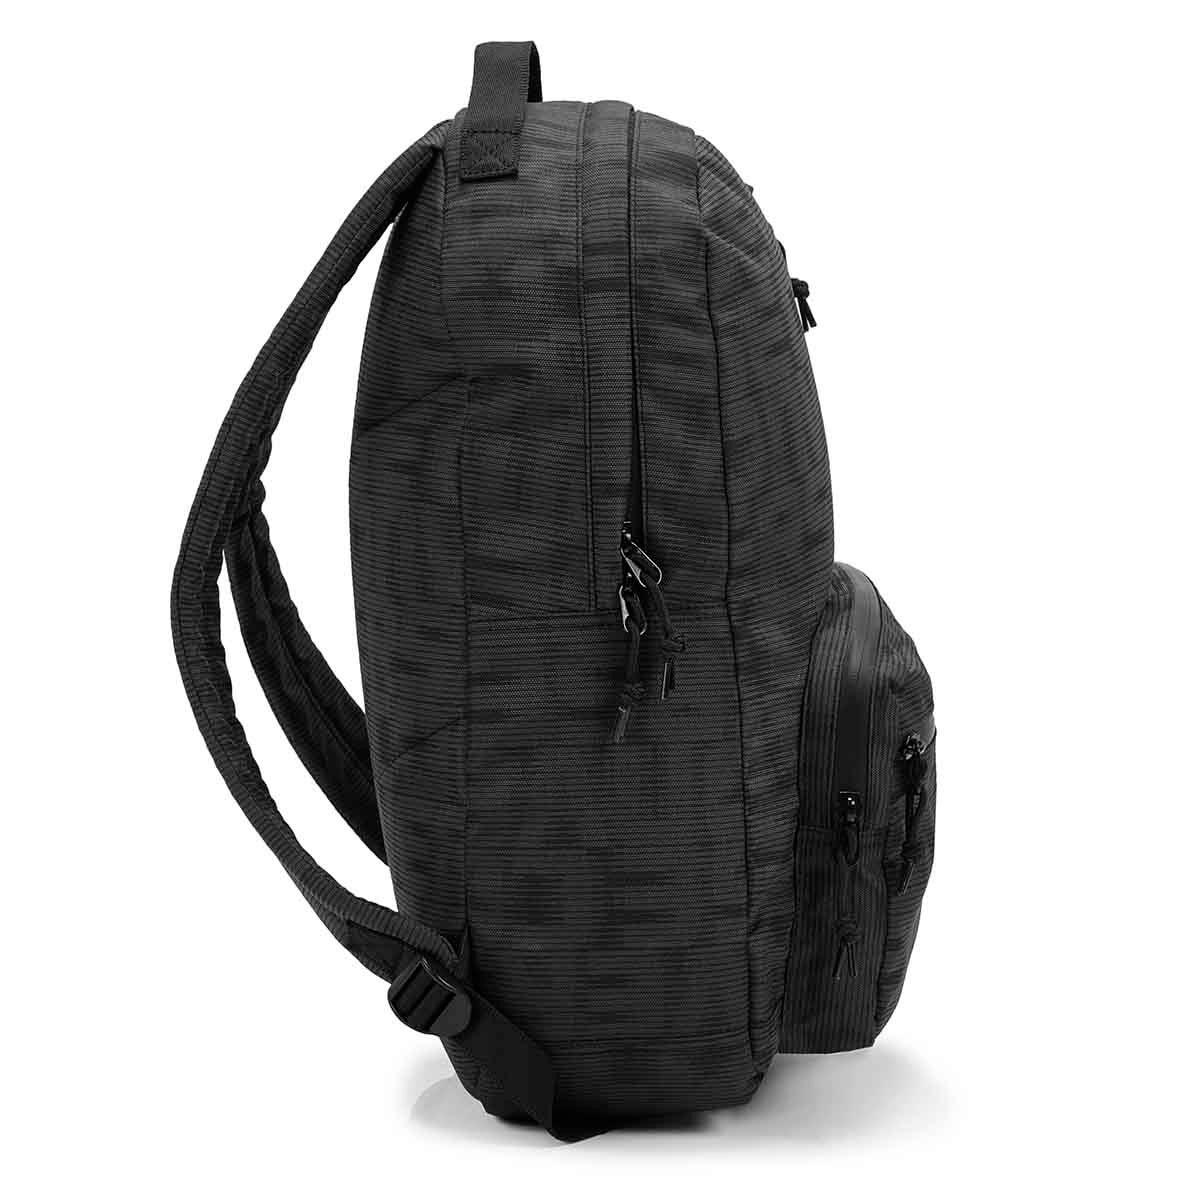 Unisex The GO wordmark backpack